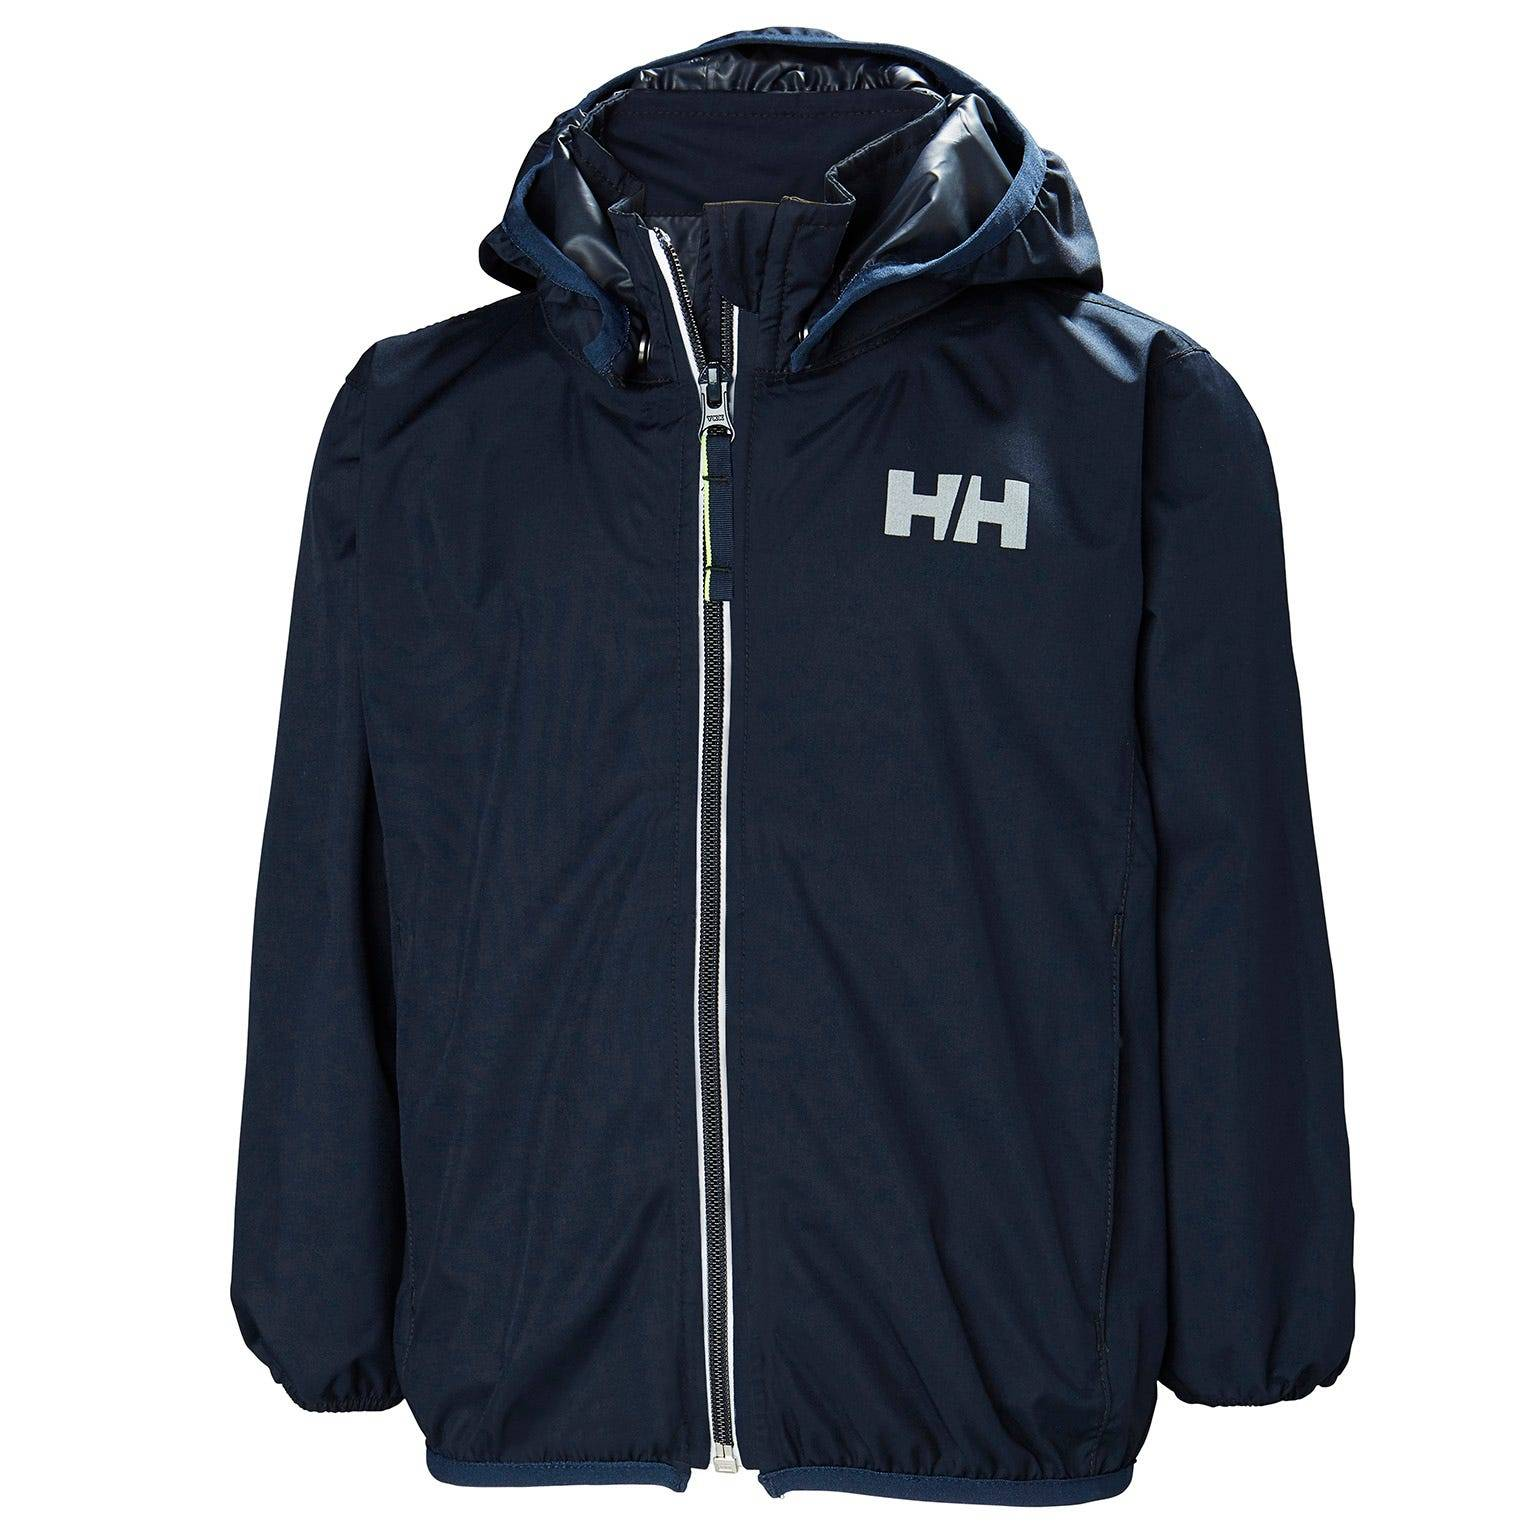 Helly Hansen Kids Helium Packable Jacket Parka Navy 110/5